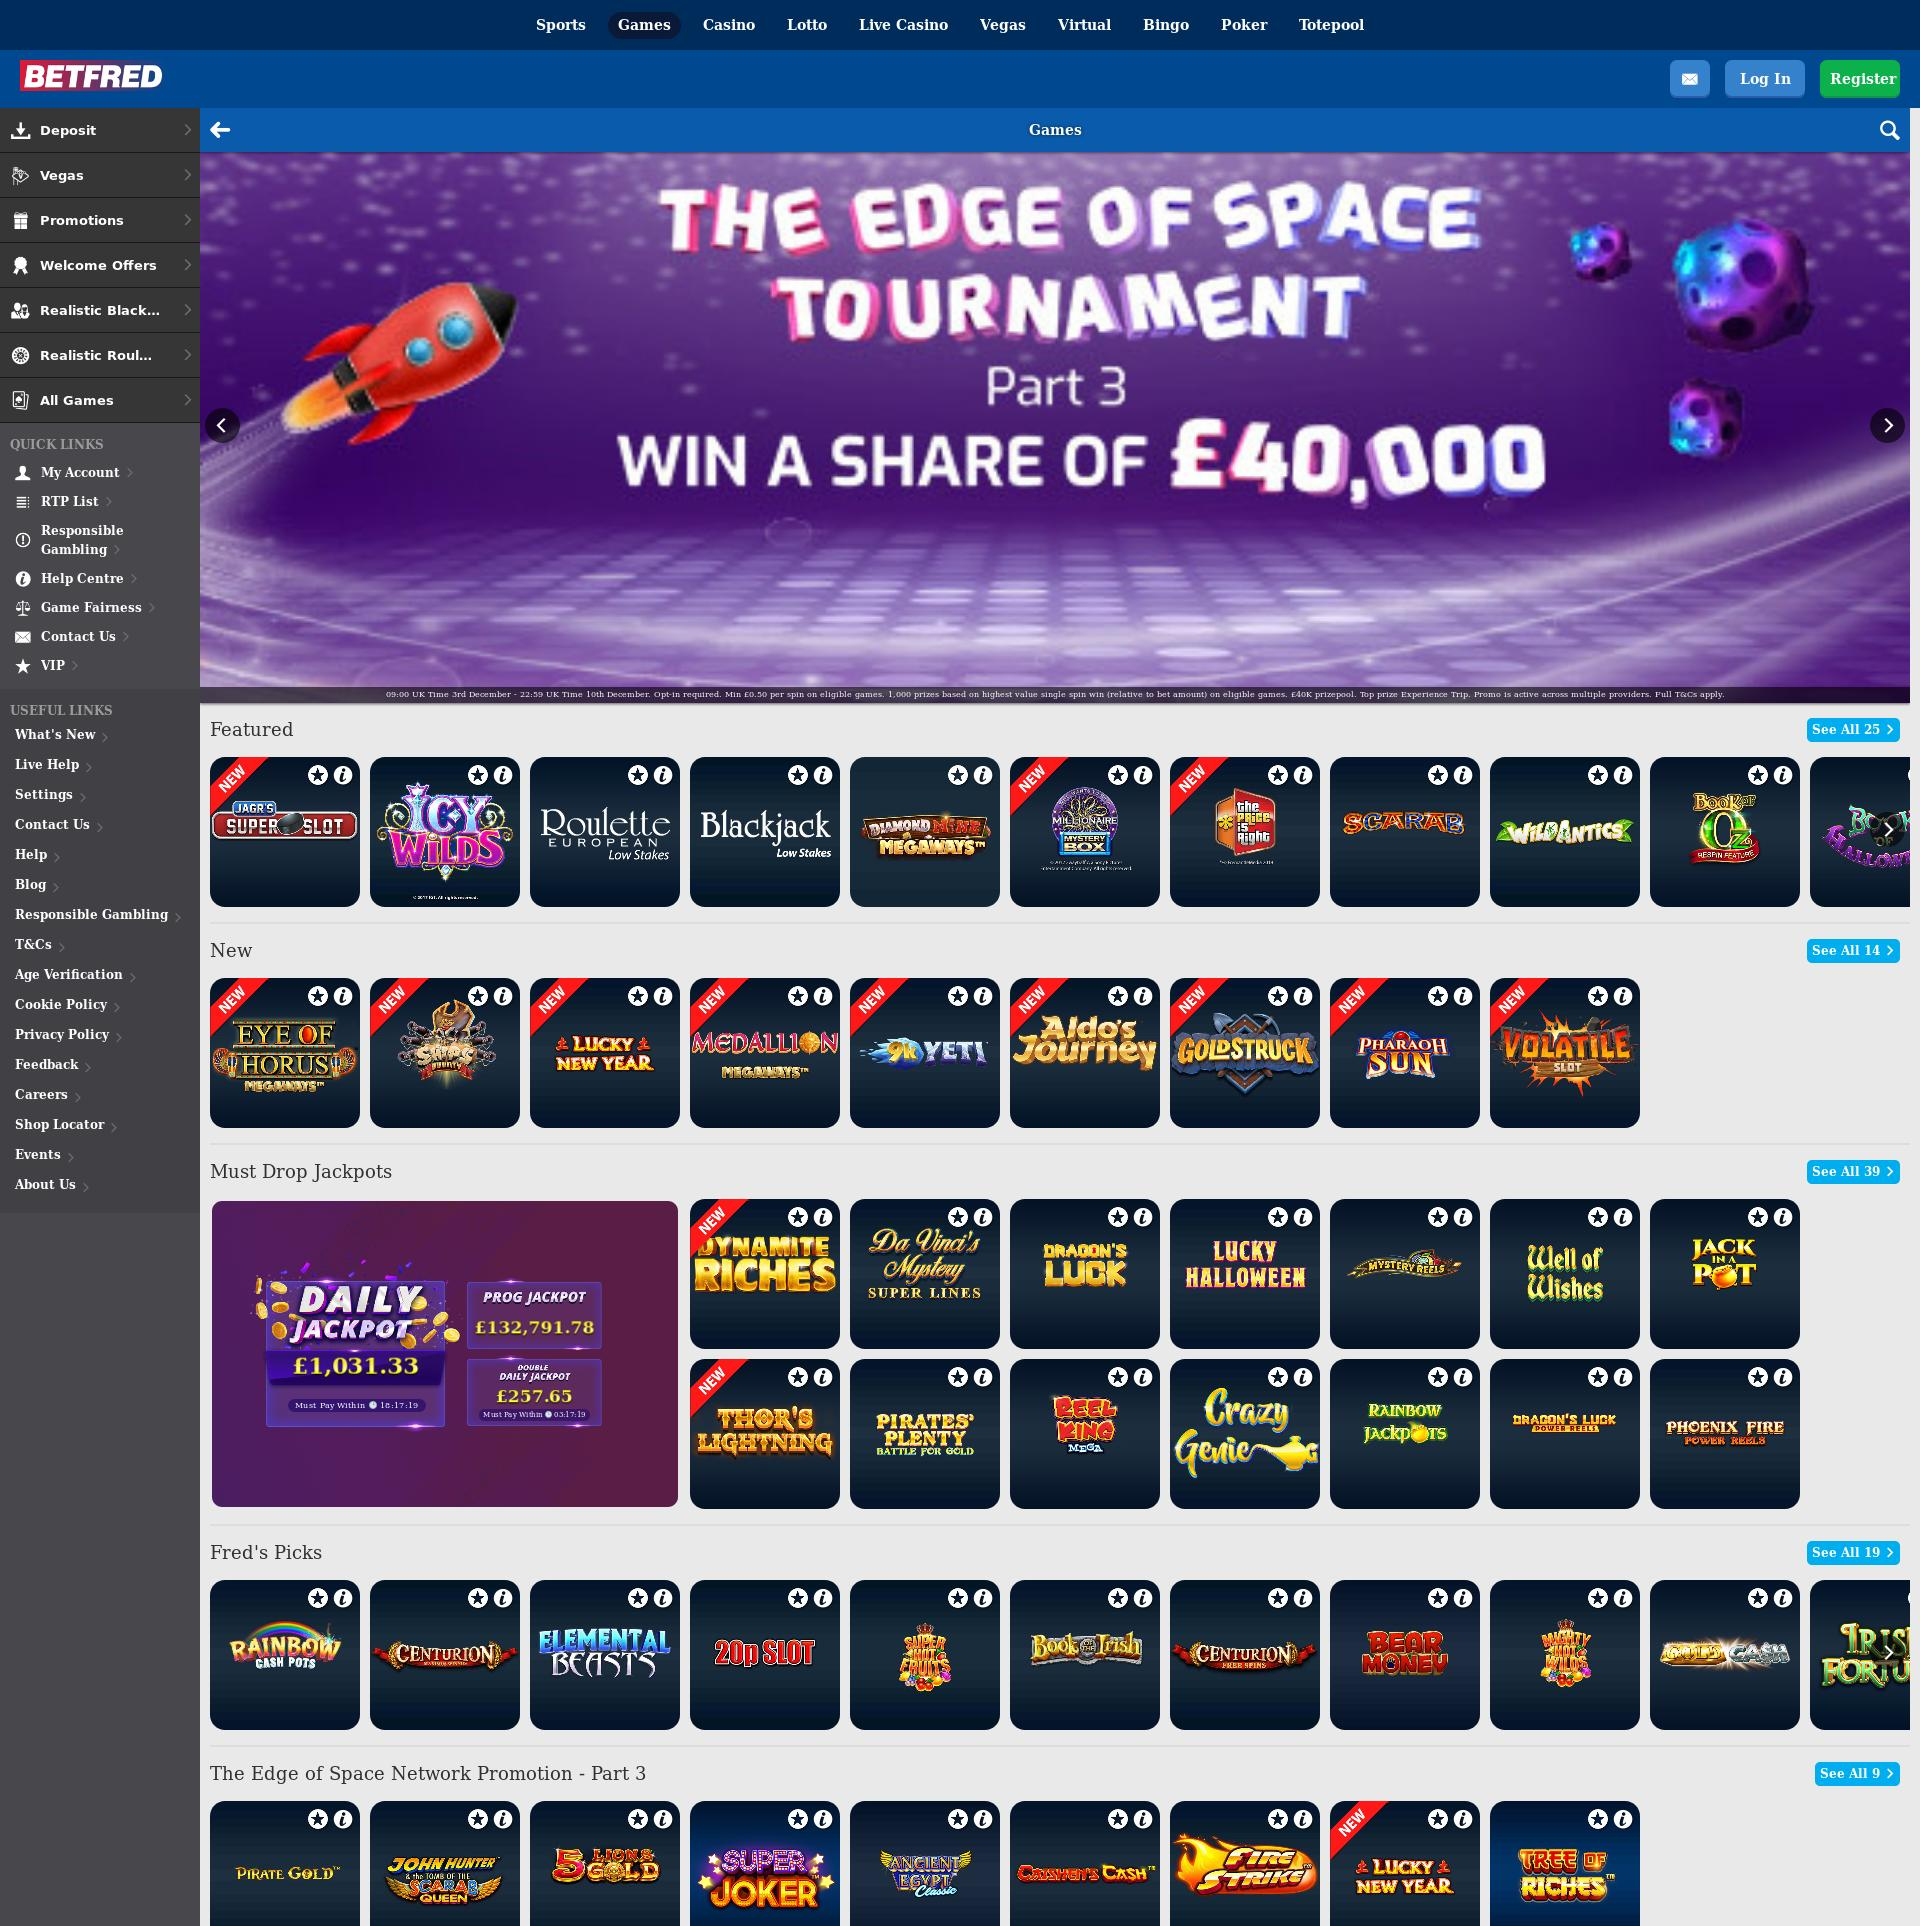 Casino screen Lobby 2019-12-04 for United Kingdom